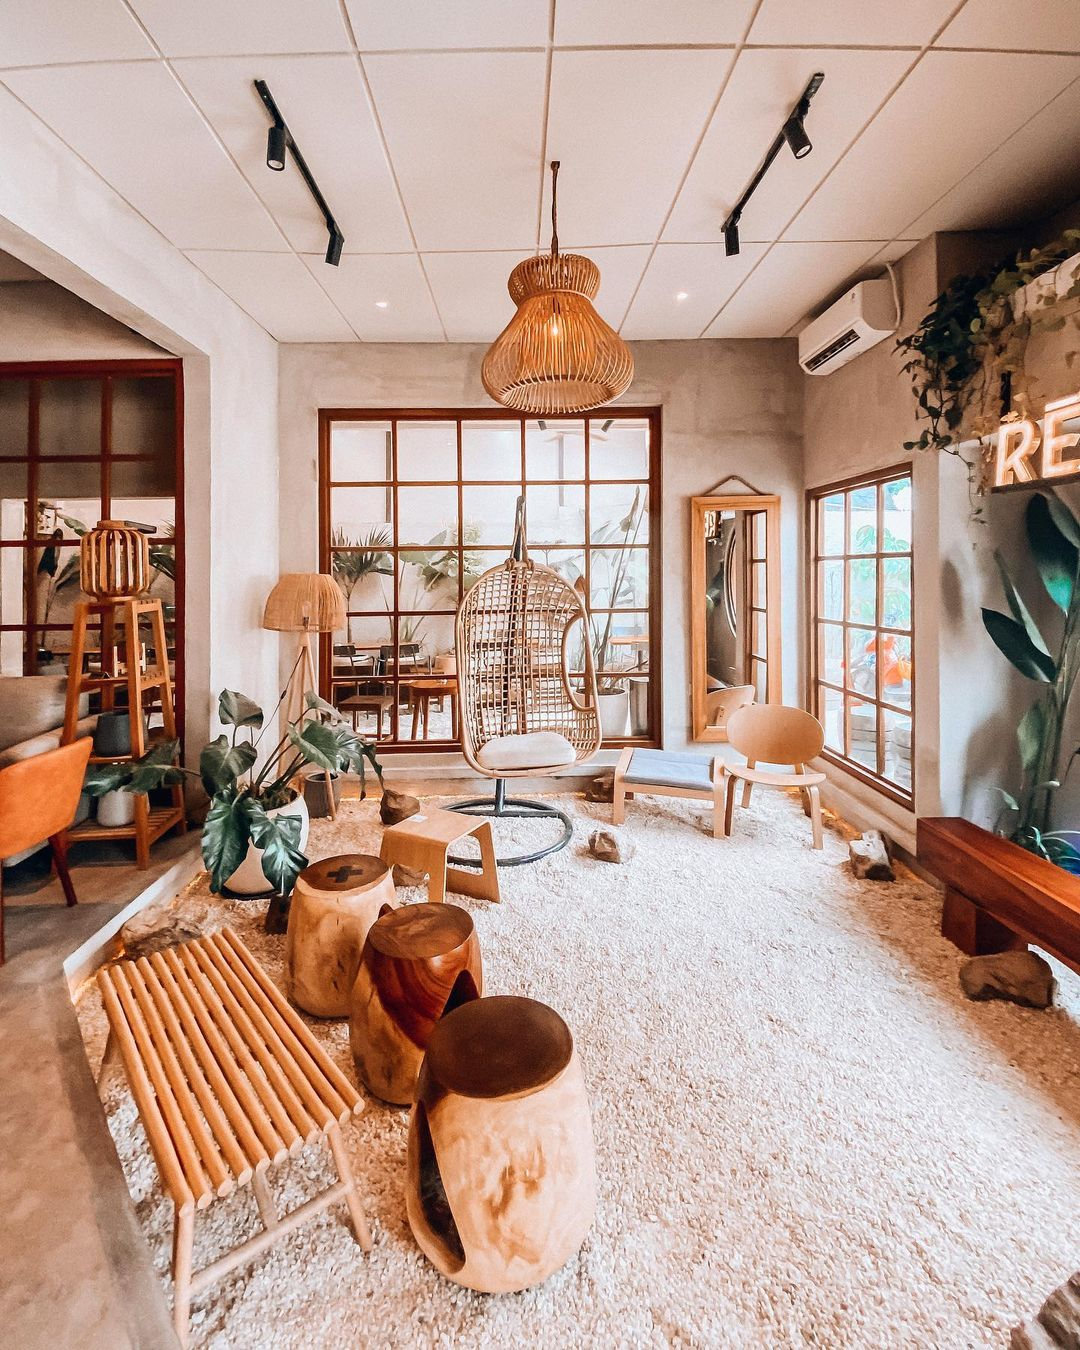 Dekorasi Di Ren Coffee Jakarta Selatan Image From @mrkulinerjkt